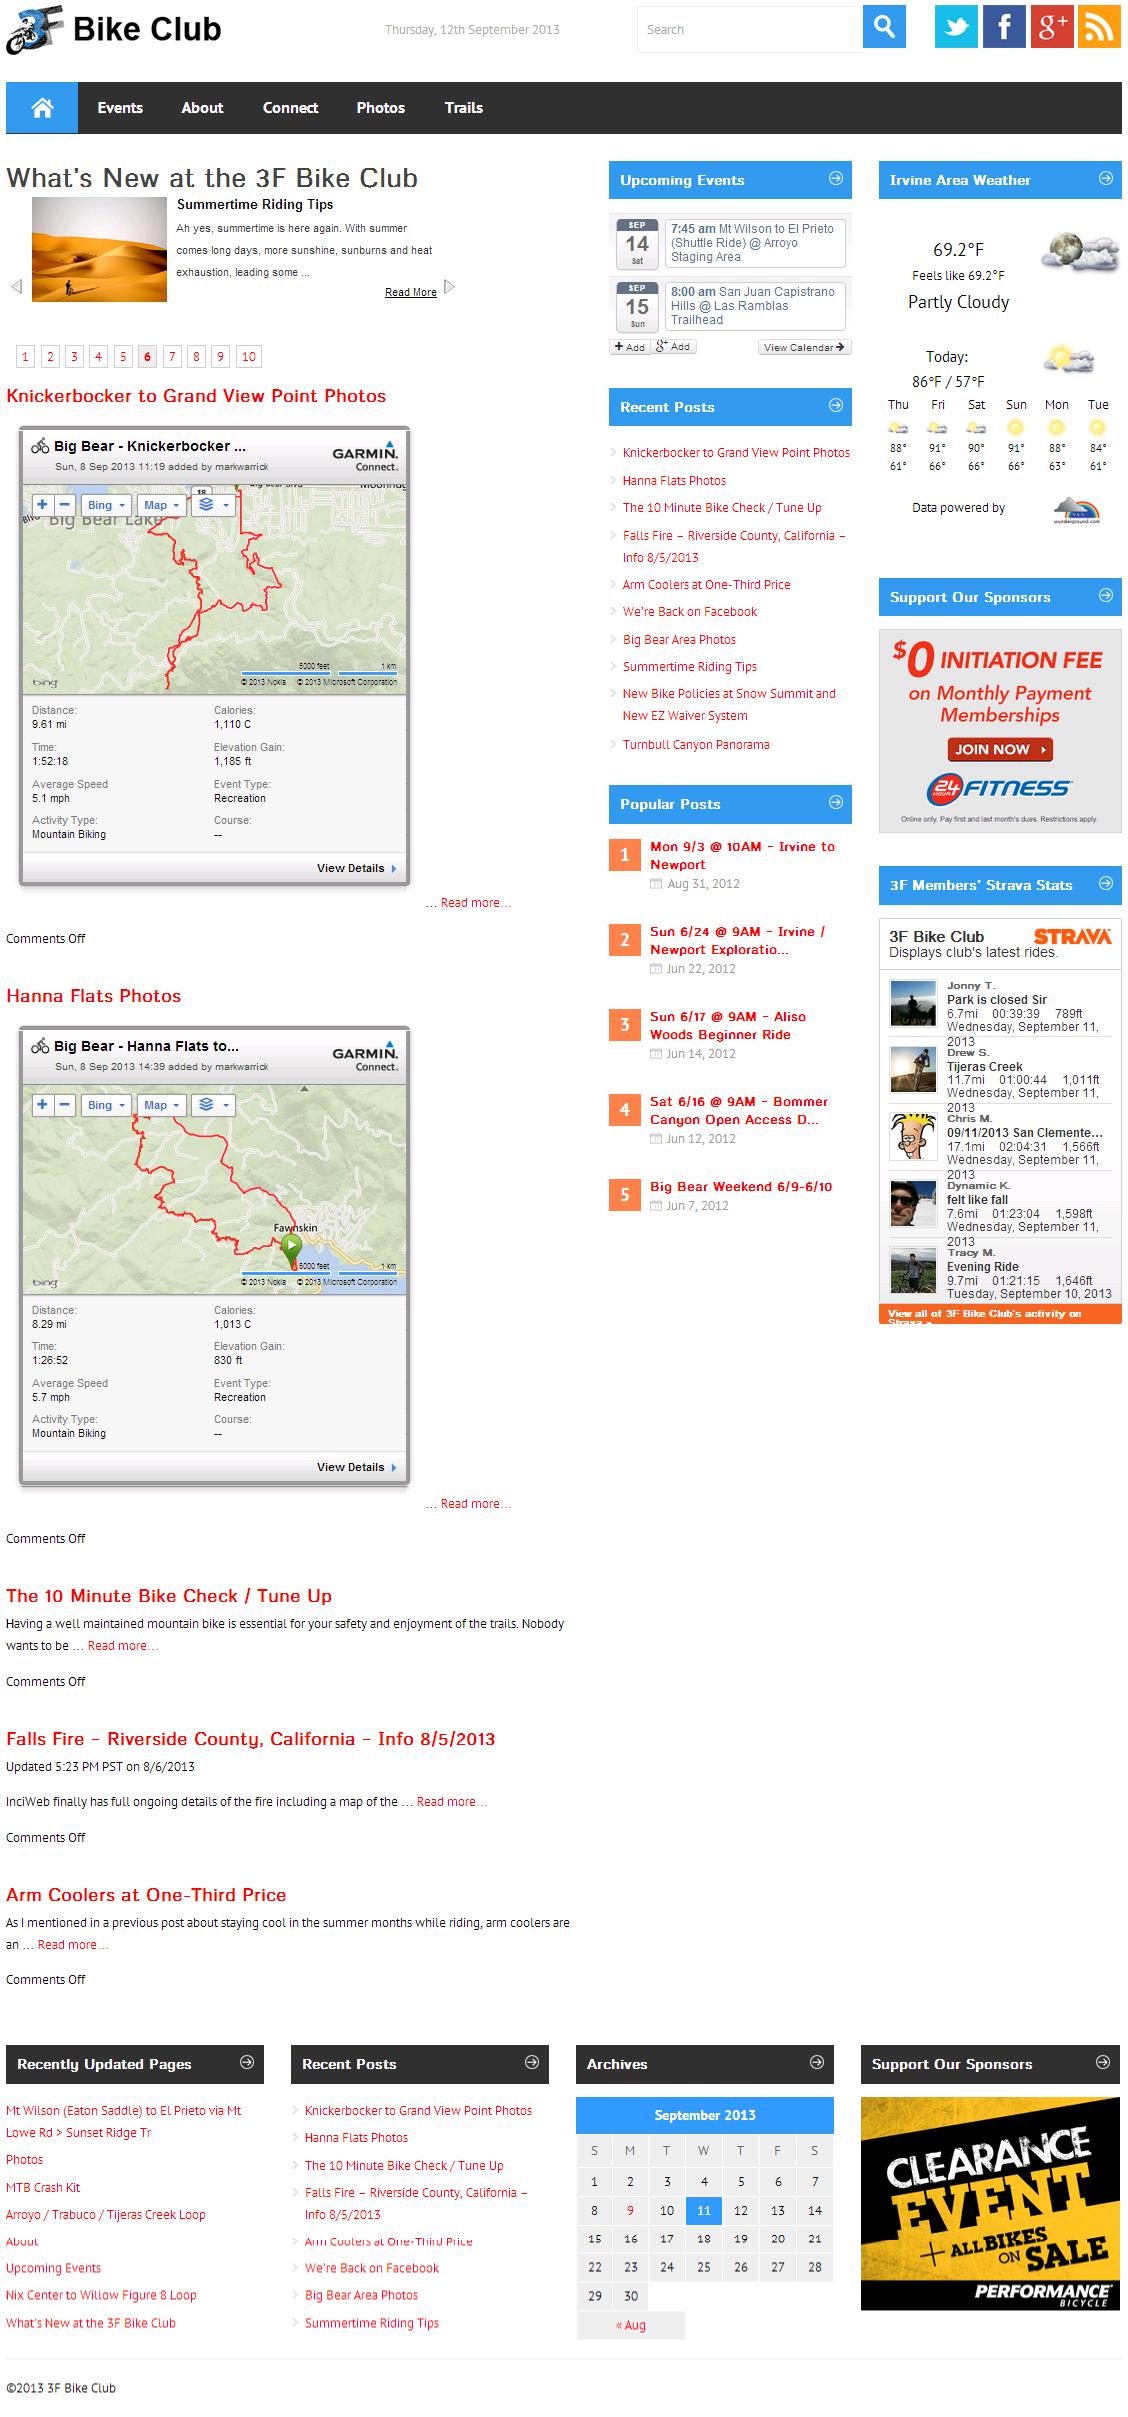 3F Bike Club Blogs